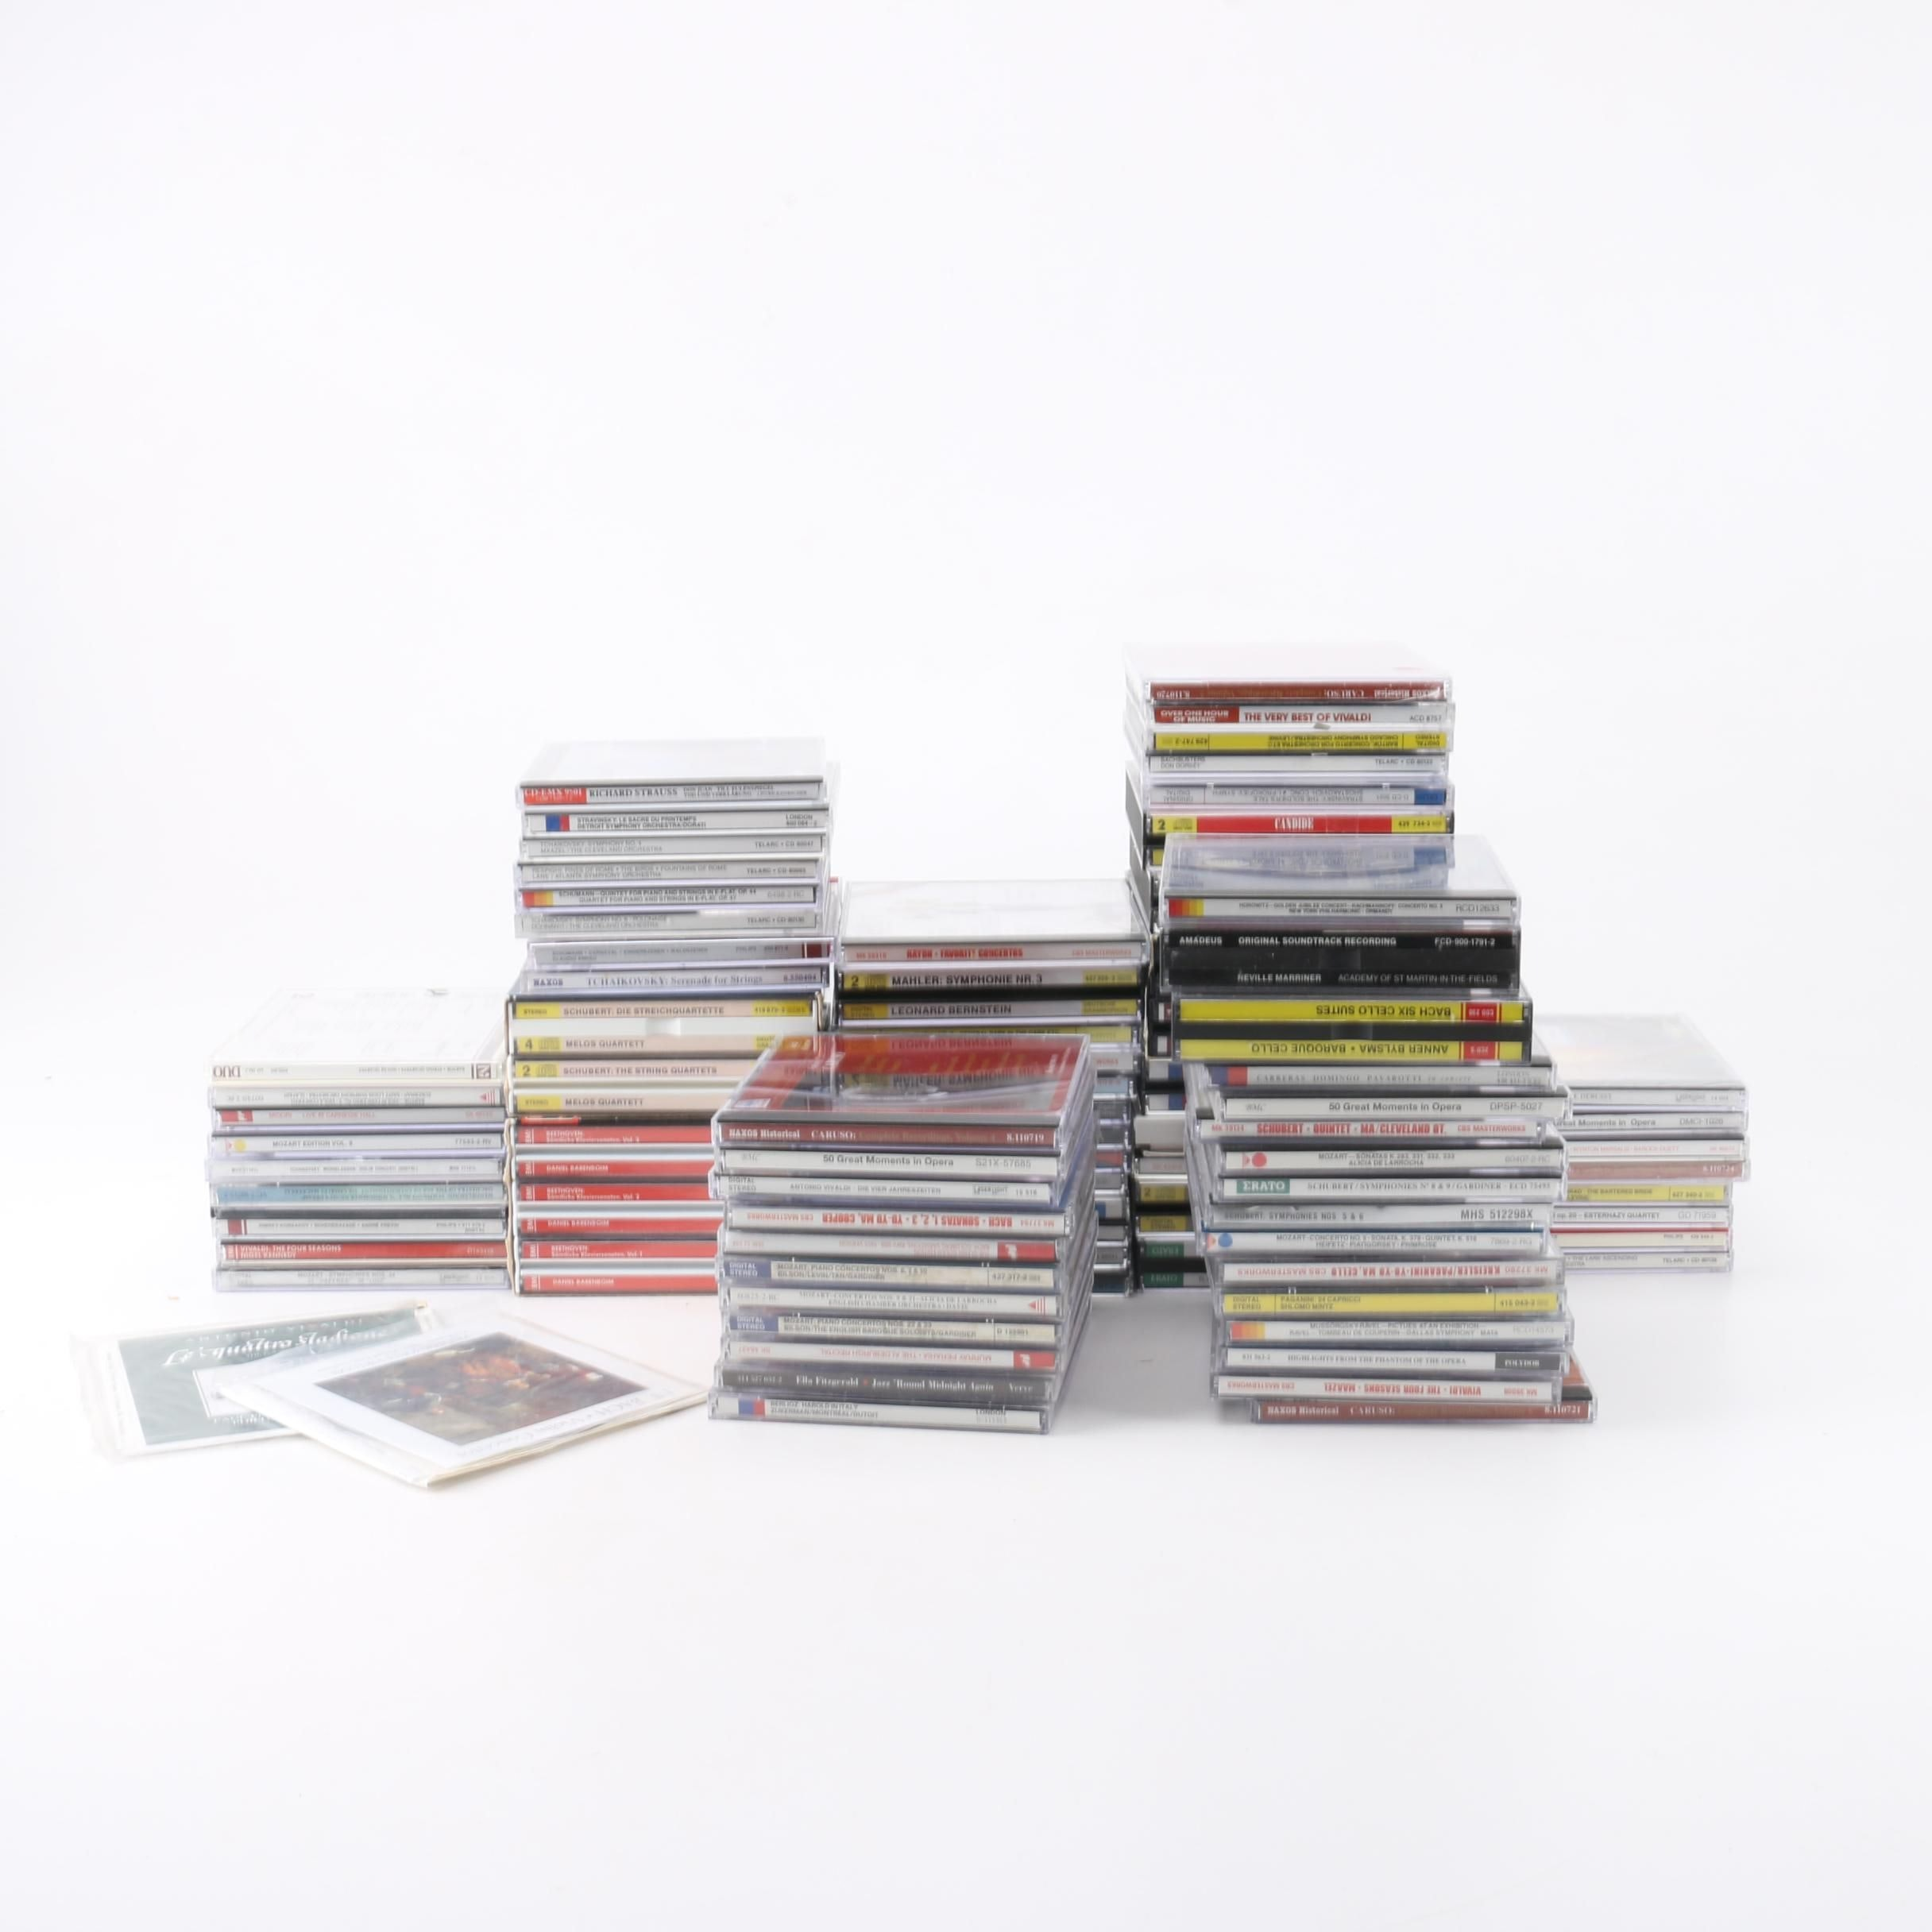 Yo-Yo Ma, Caruso, Ella Fitzgerald and Other Classical and Jazz CDs